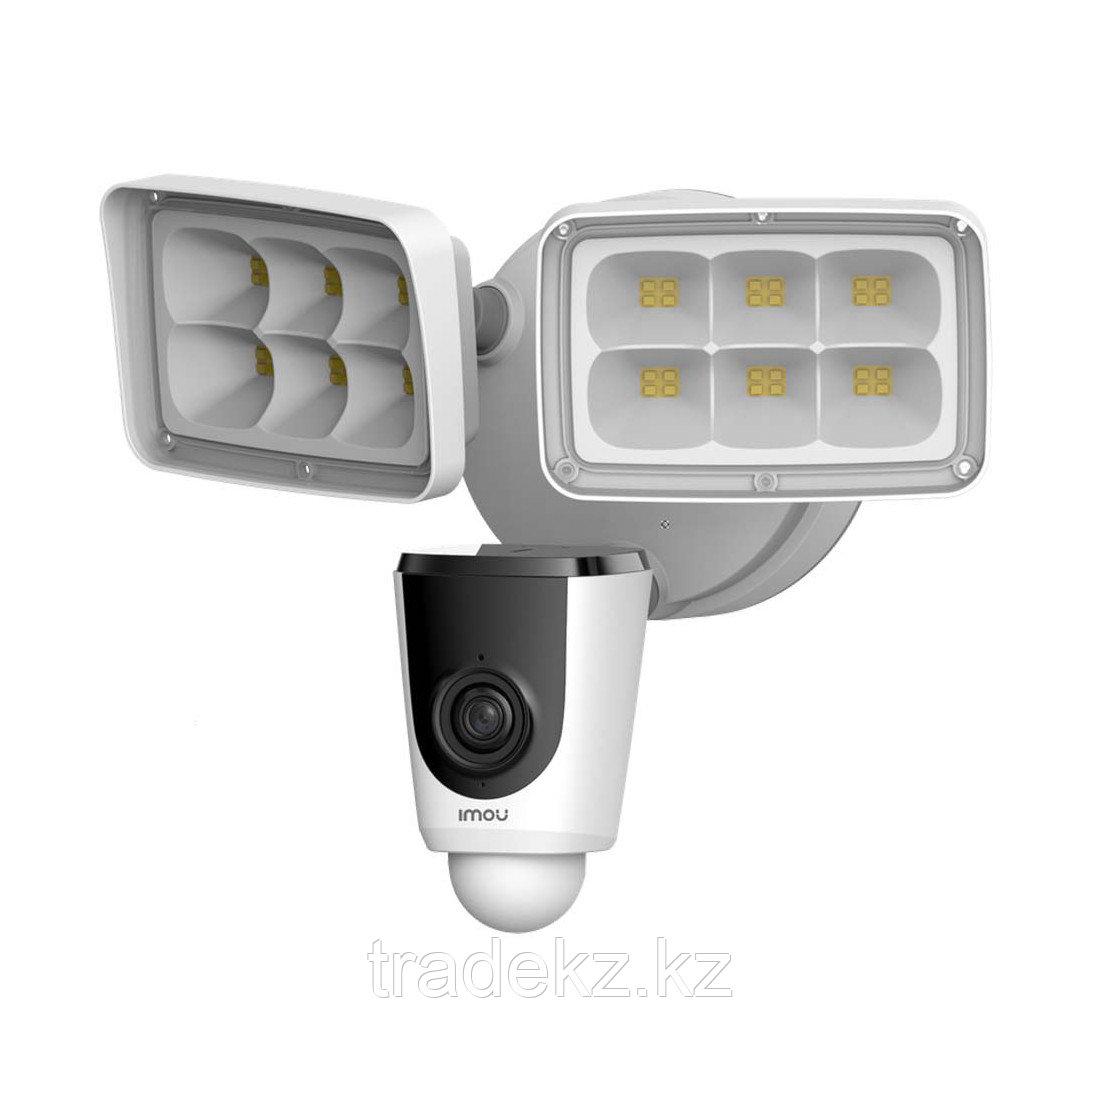 Интернет-камера, Wi-Fi видеокамера Imou Floodlight Cam